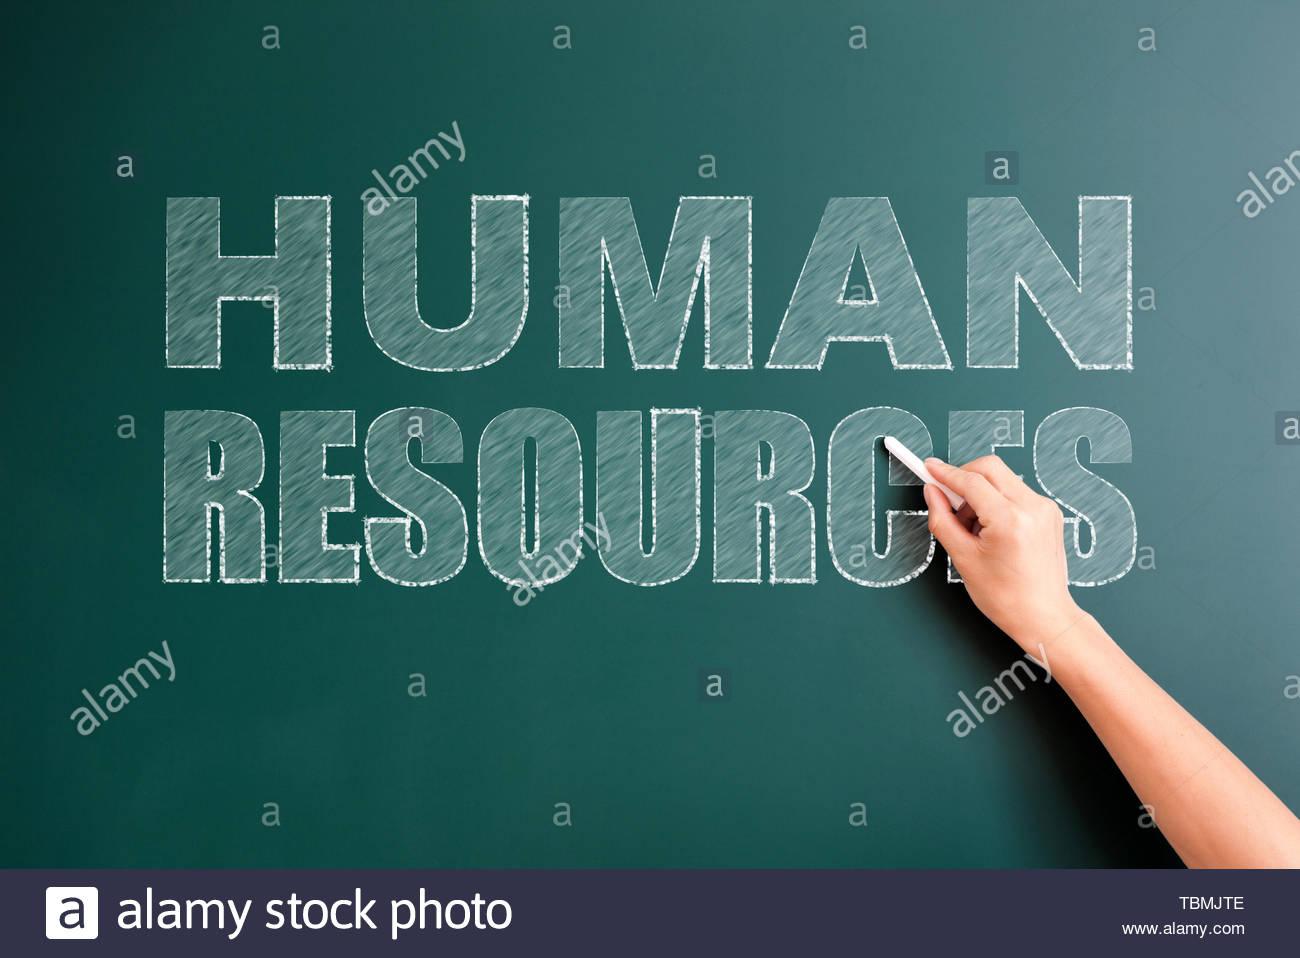 human resources written on blackboard - Stock Image